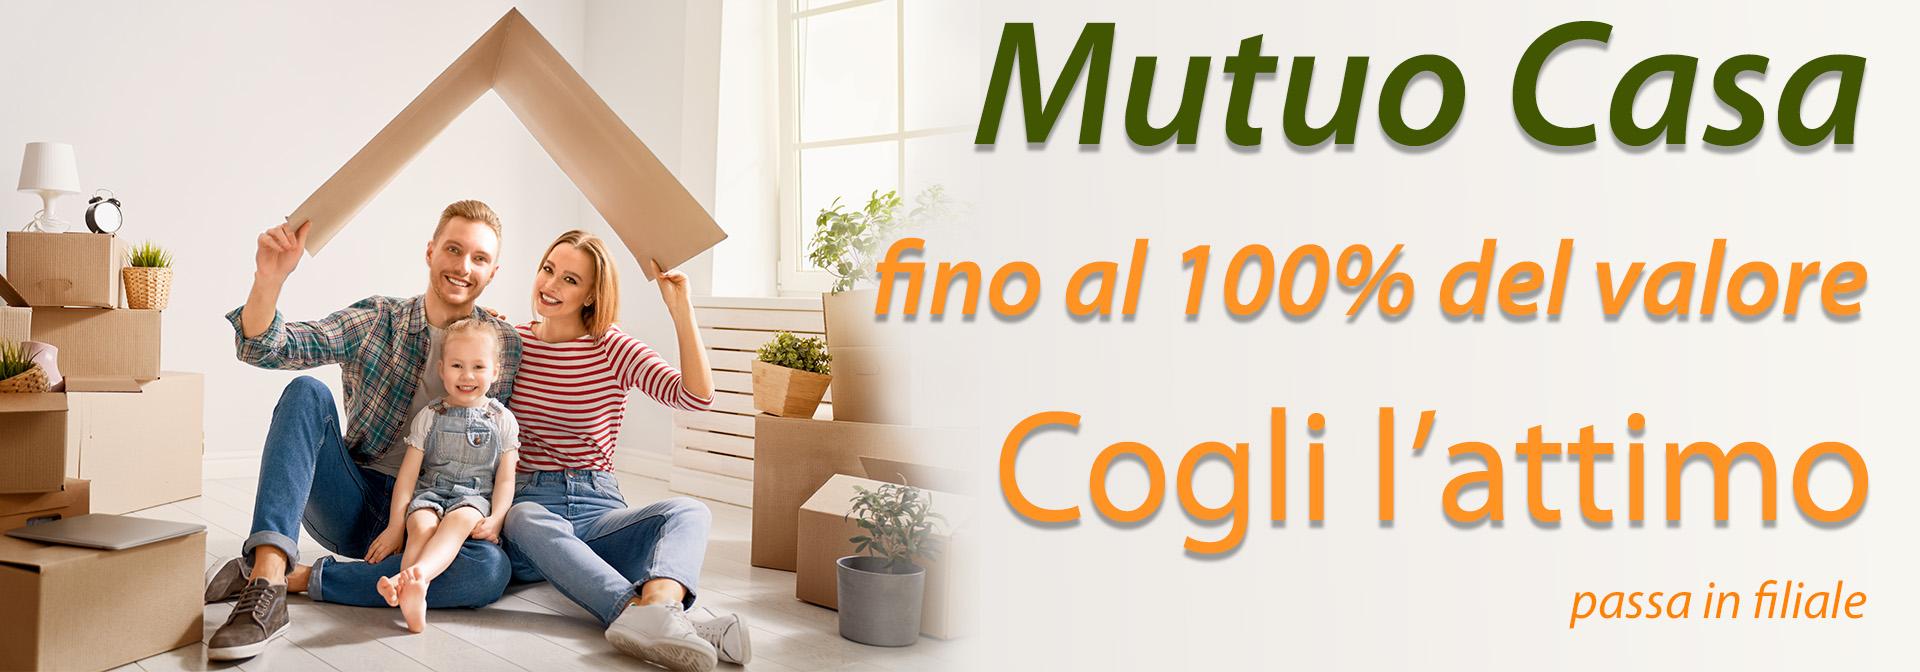 Mutuo Consap 100